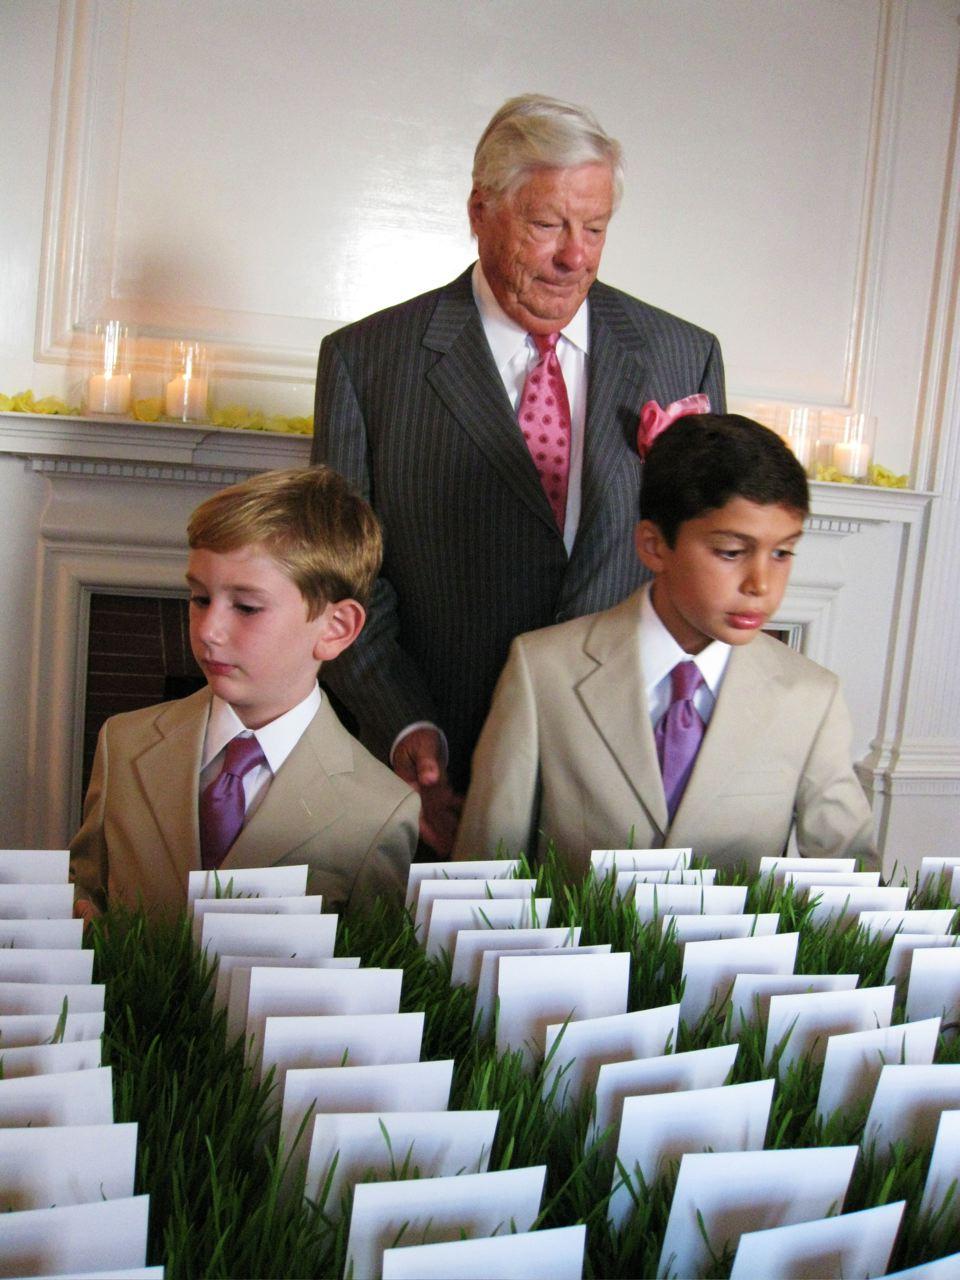 Boston Wedding - Photo Credit: Carl Bower